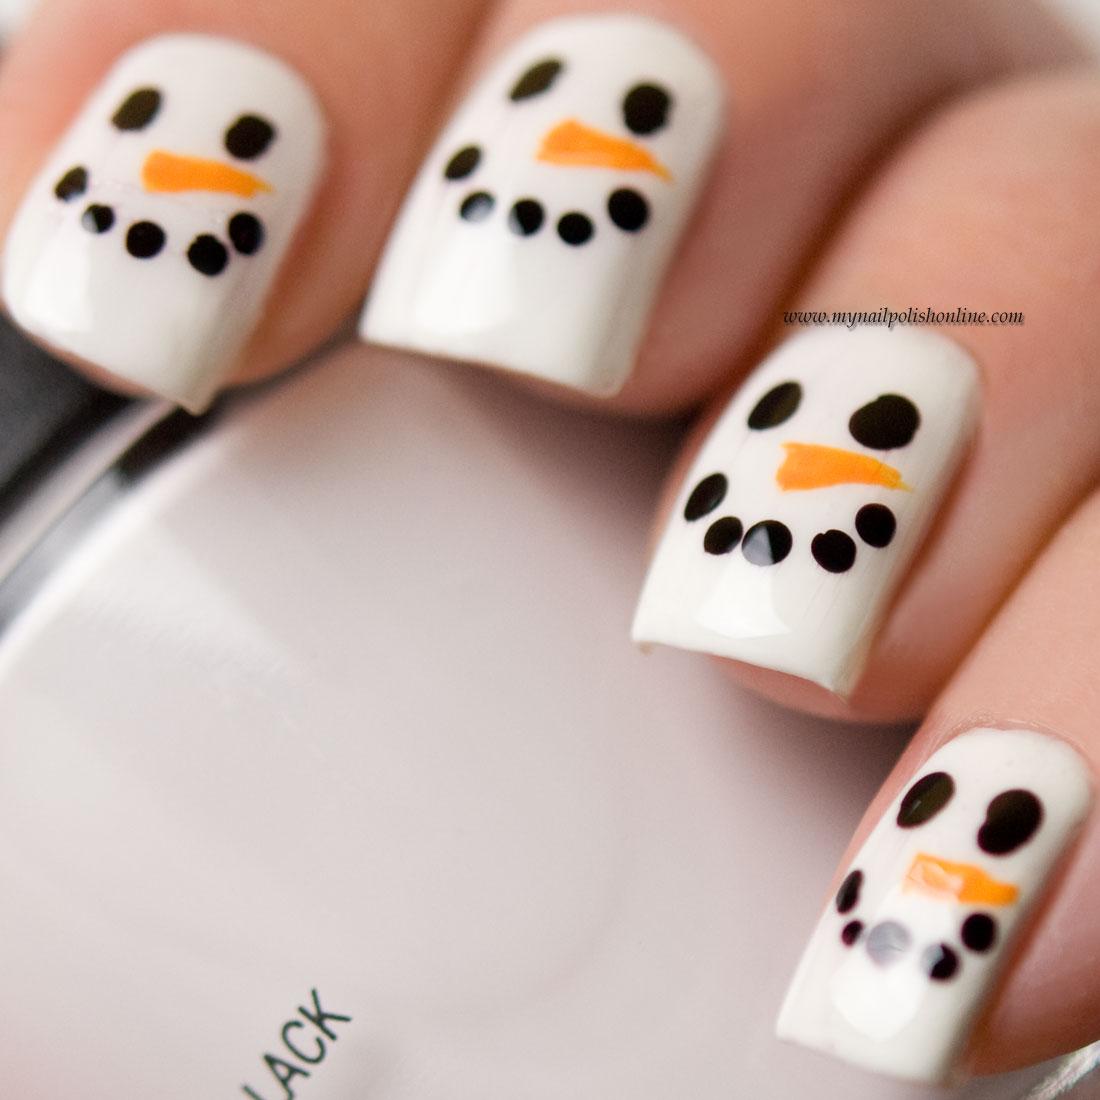 Nail Art Snowman